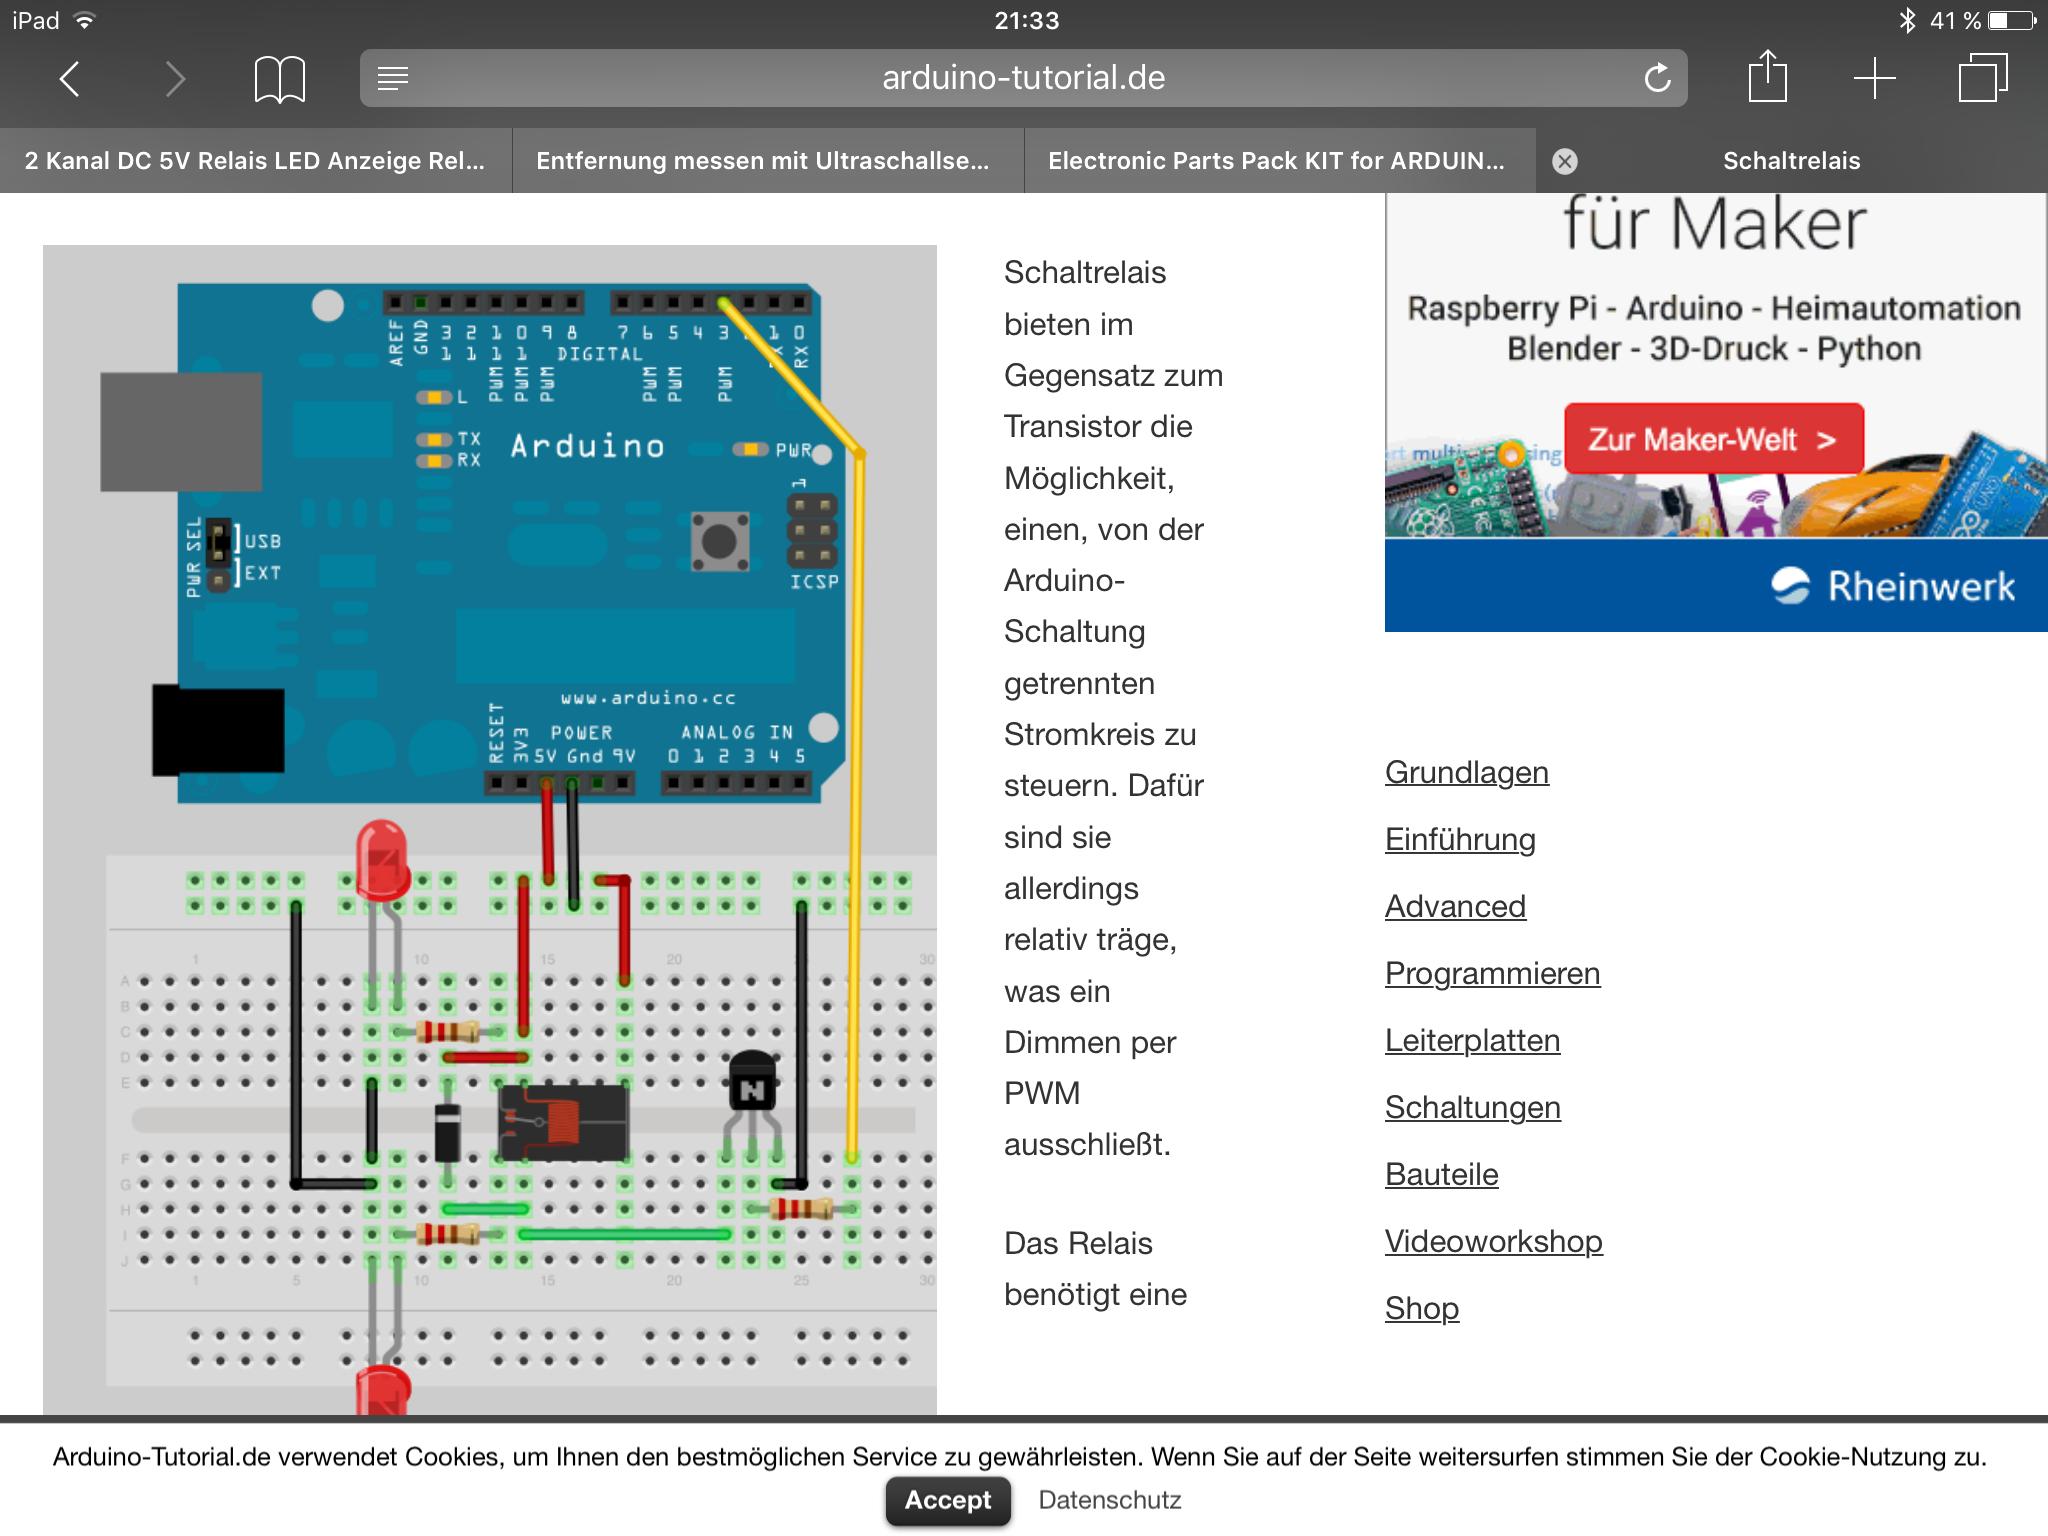 Raspberry pi printrelai (Elektronik, Schaltung, Widerstand)